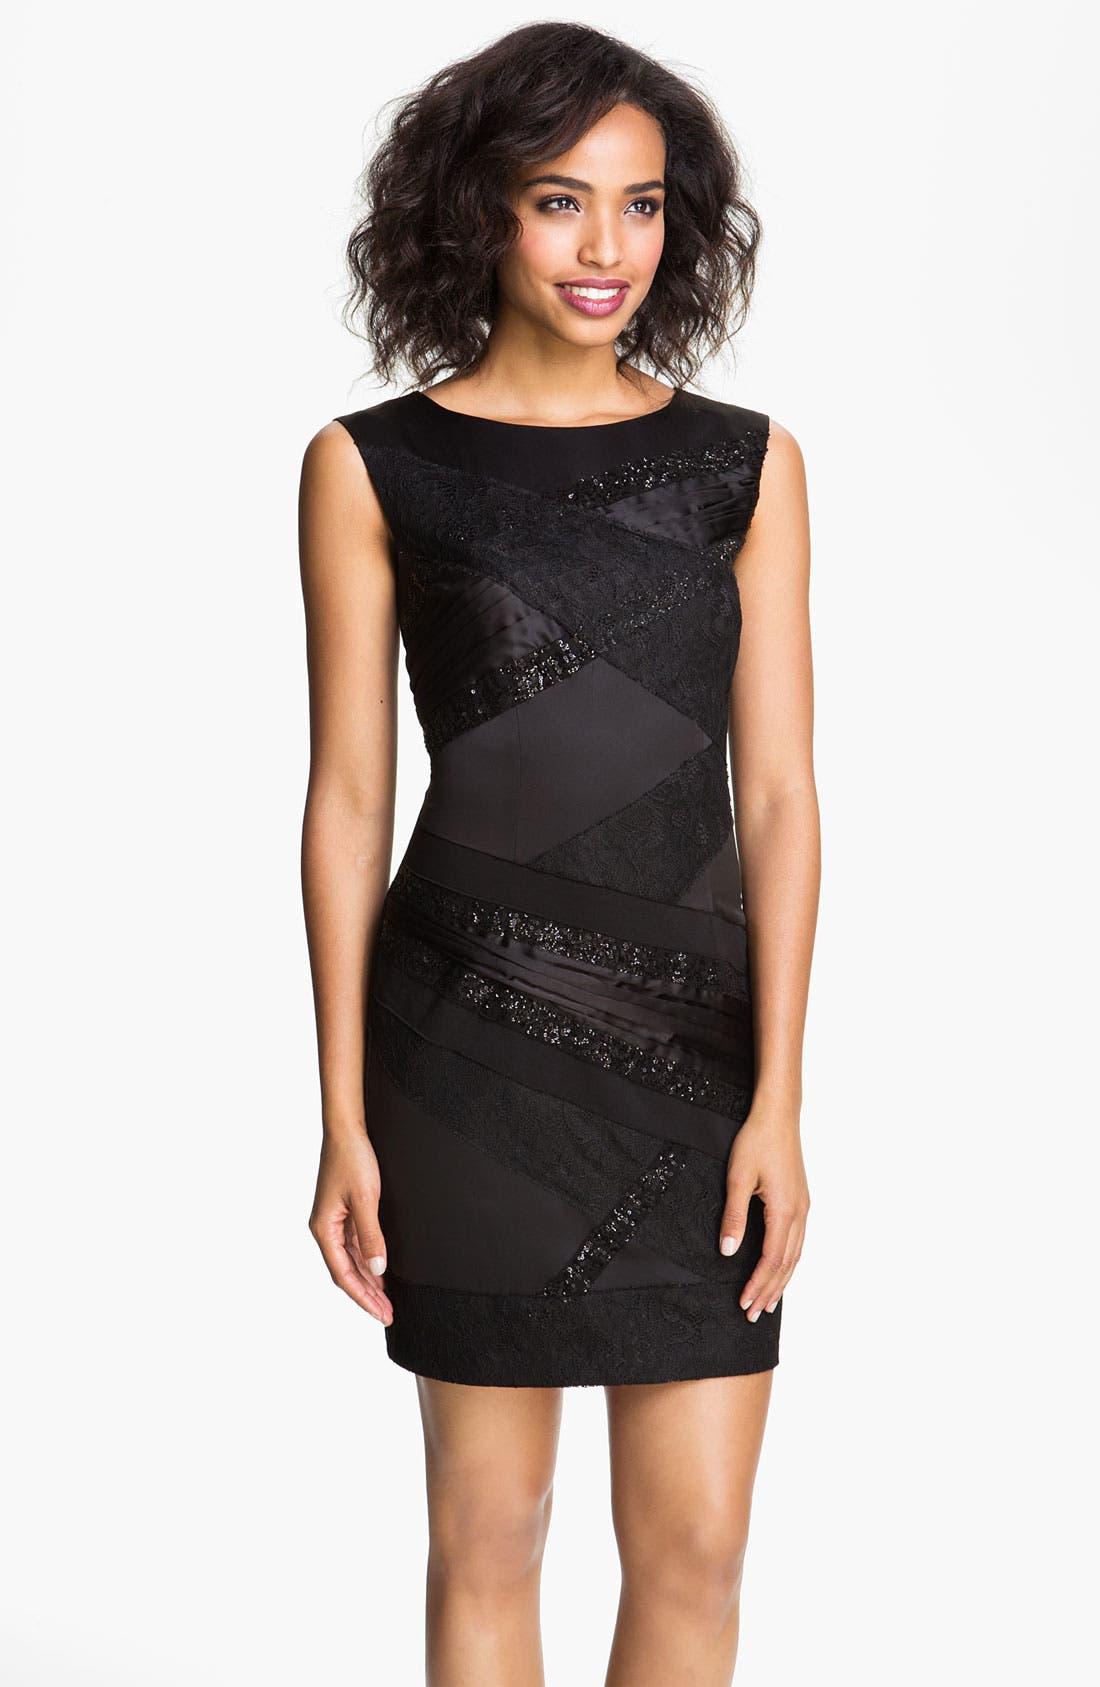 Main Image - Jessica Simpson Back Cutout Mixed Media Sheath Dress